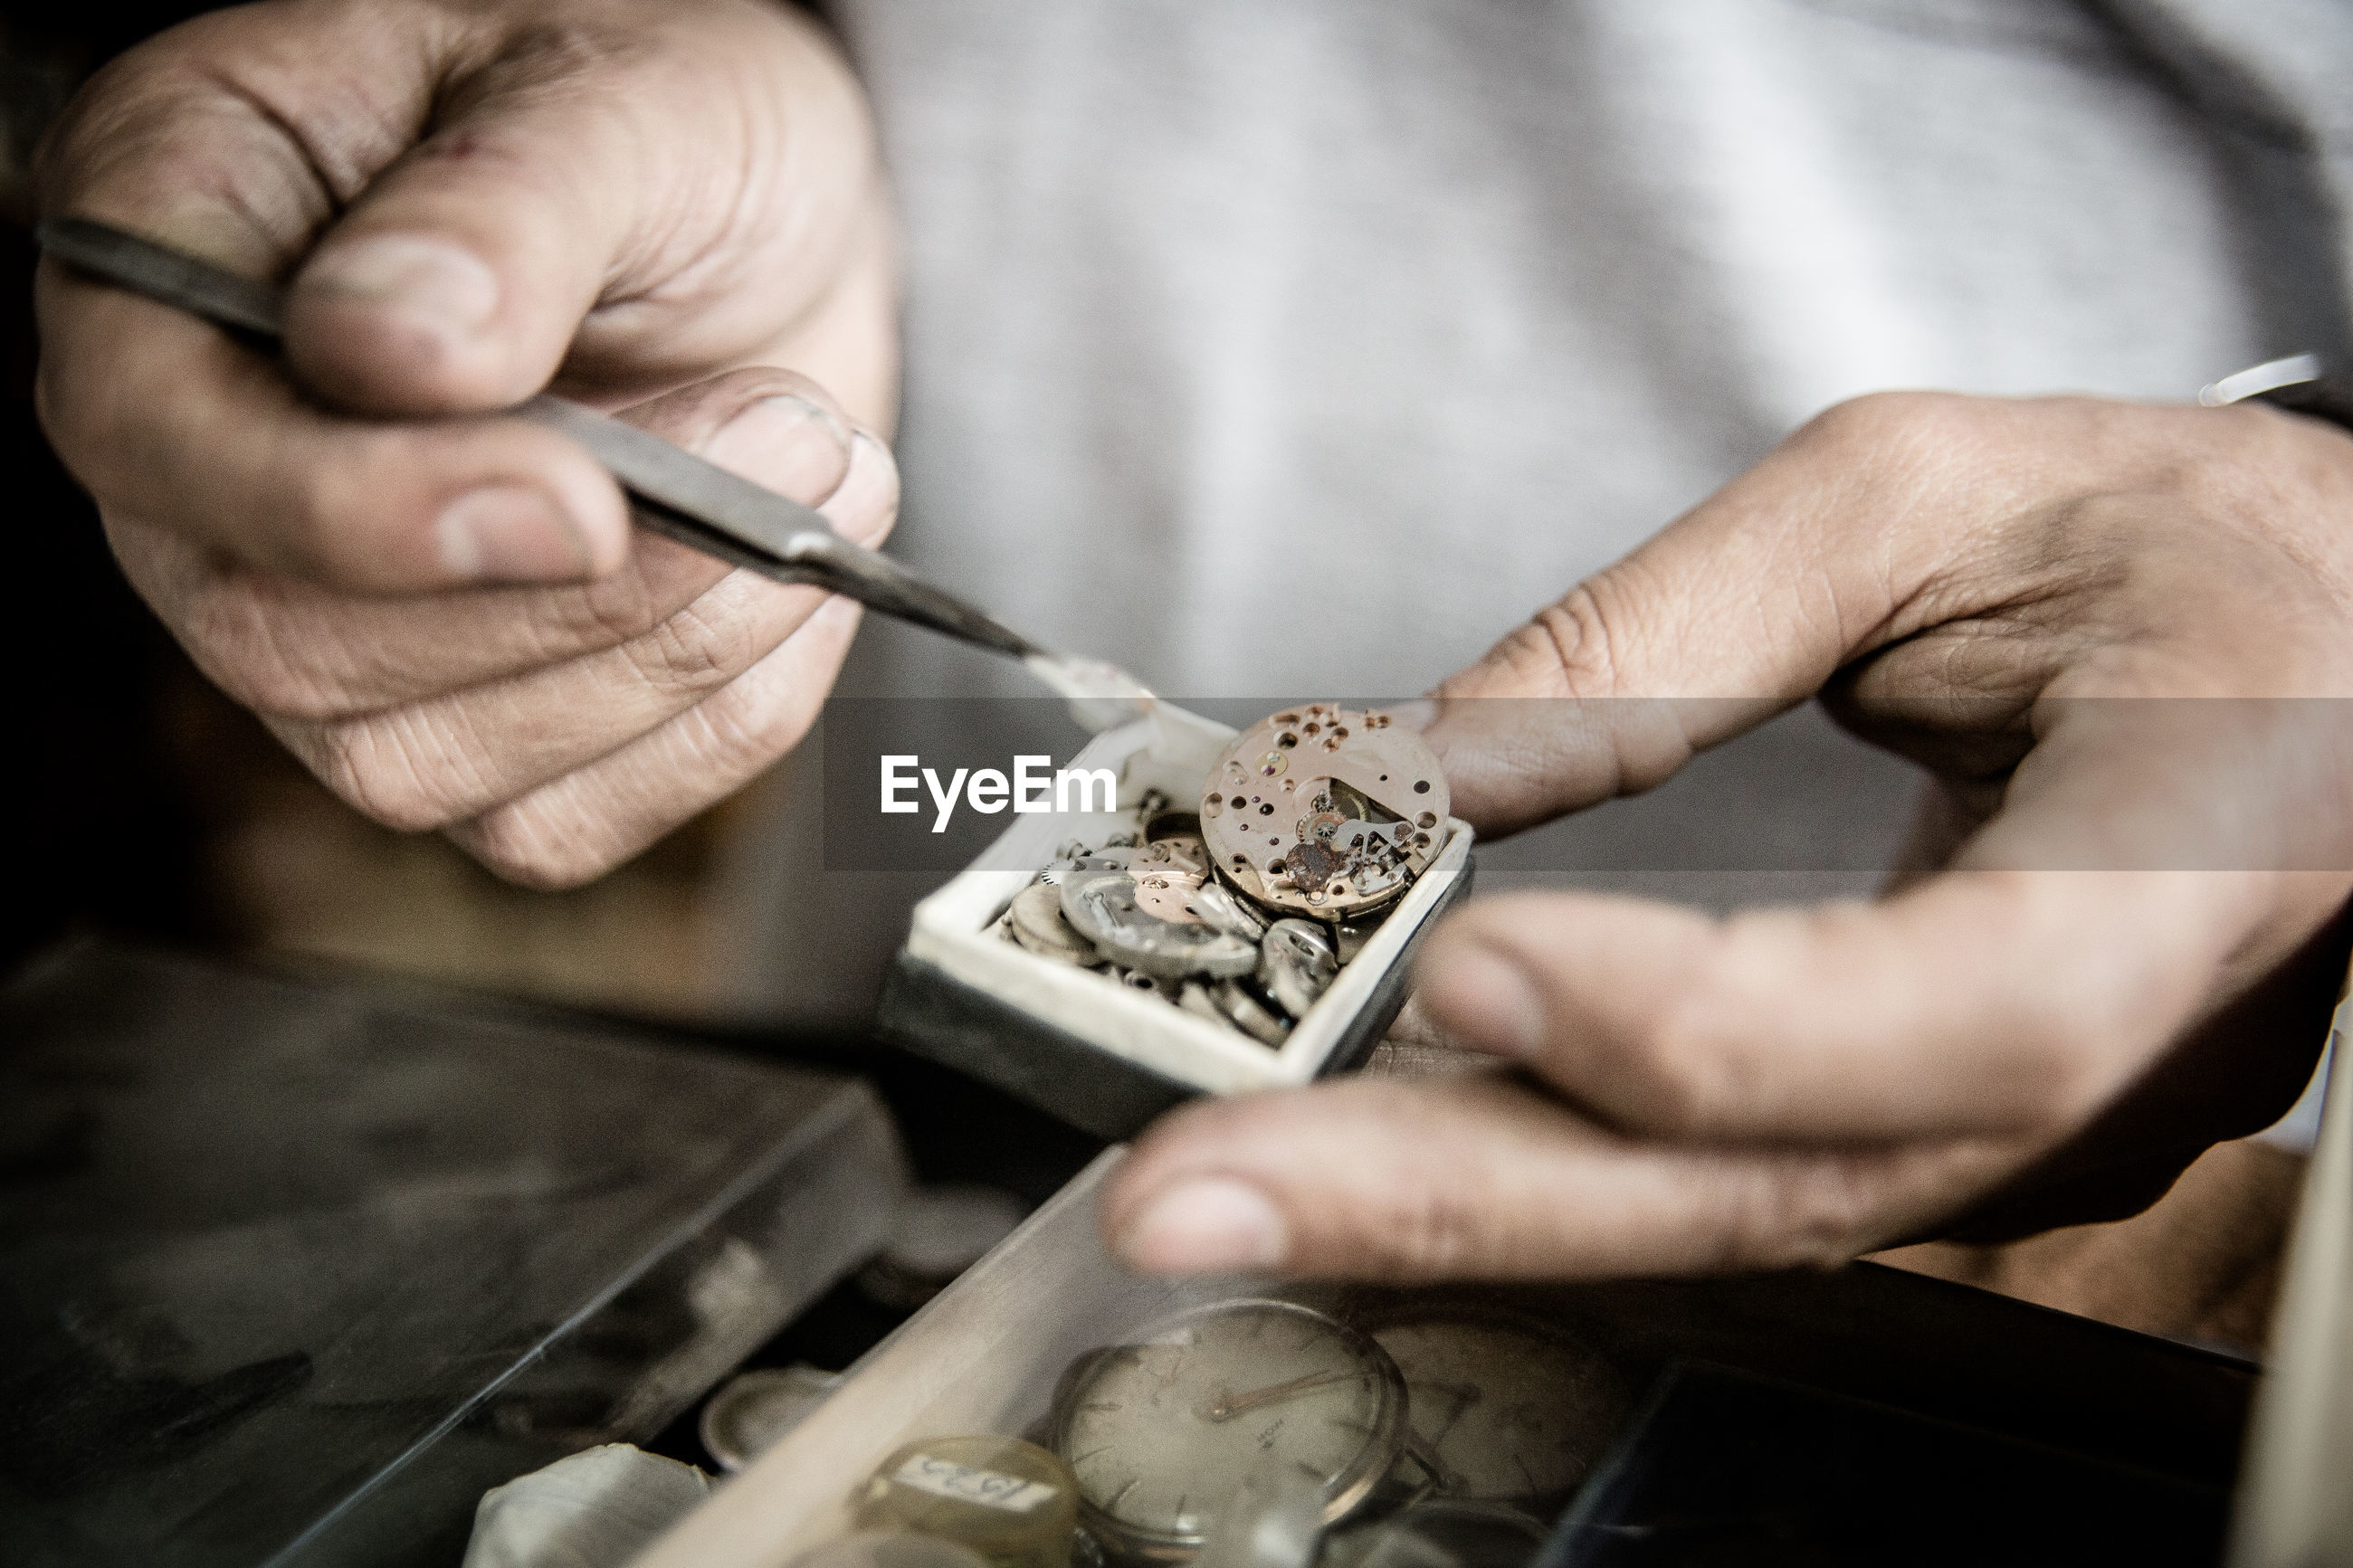 Close-up of hand repairing wristwatch